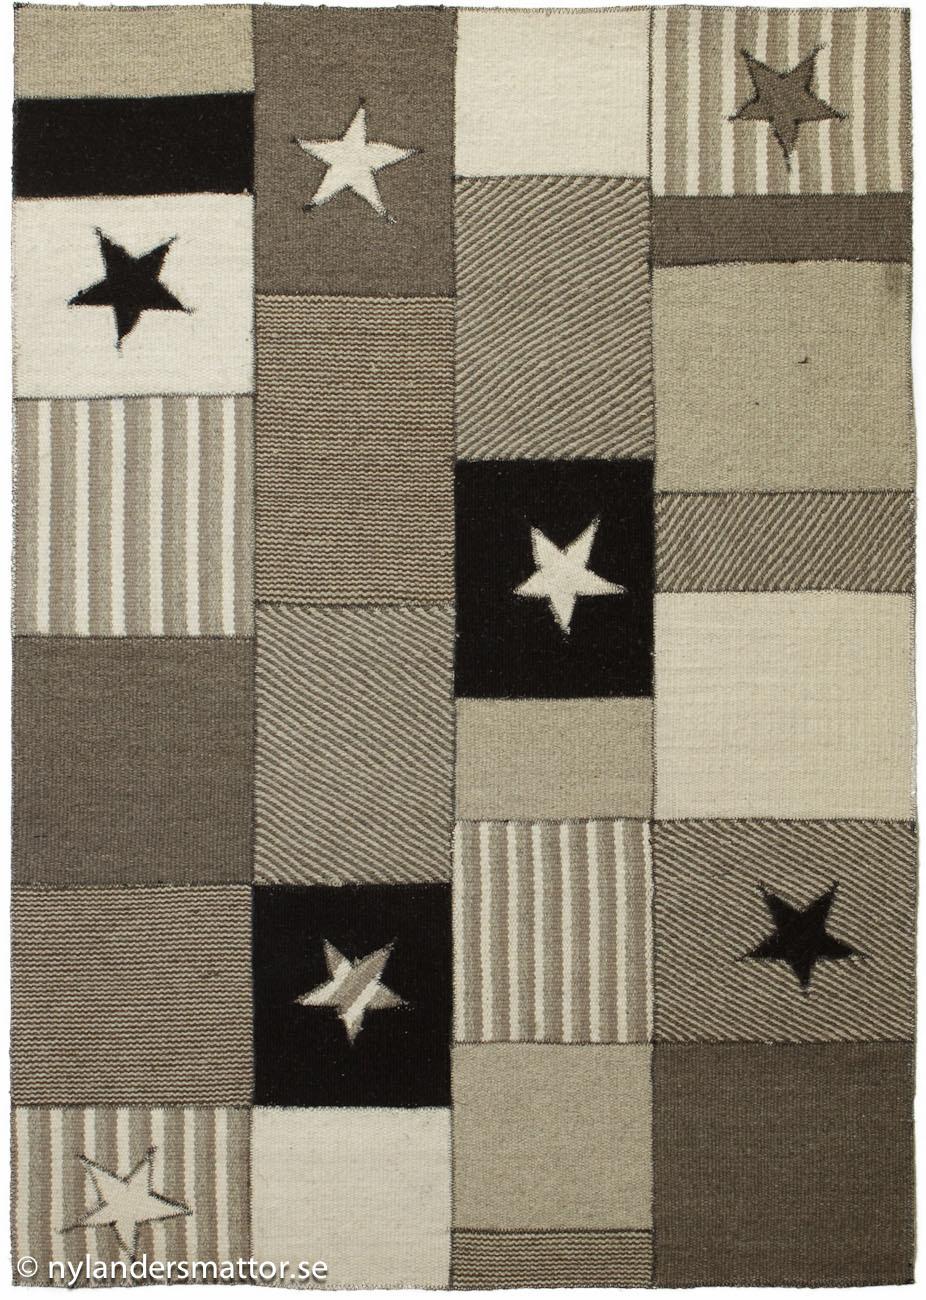 Spirit   patchworkmatta i ull   nylanders mattor